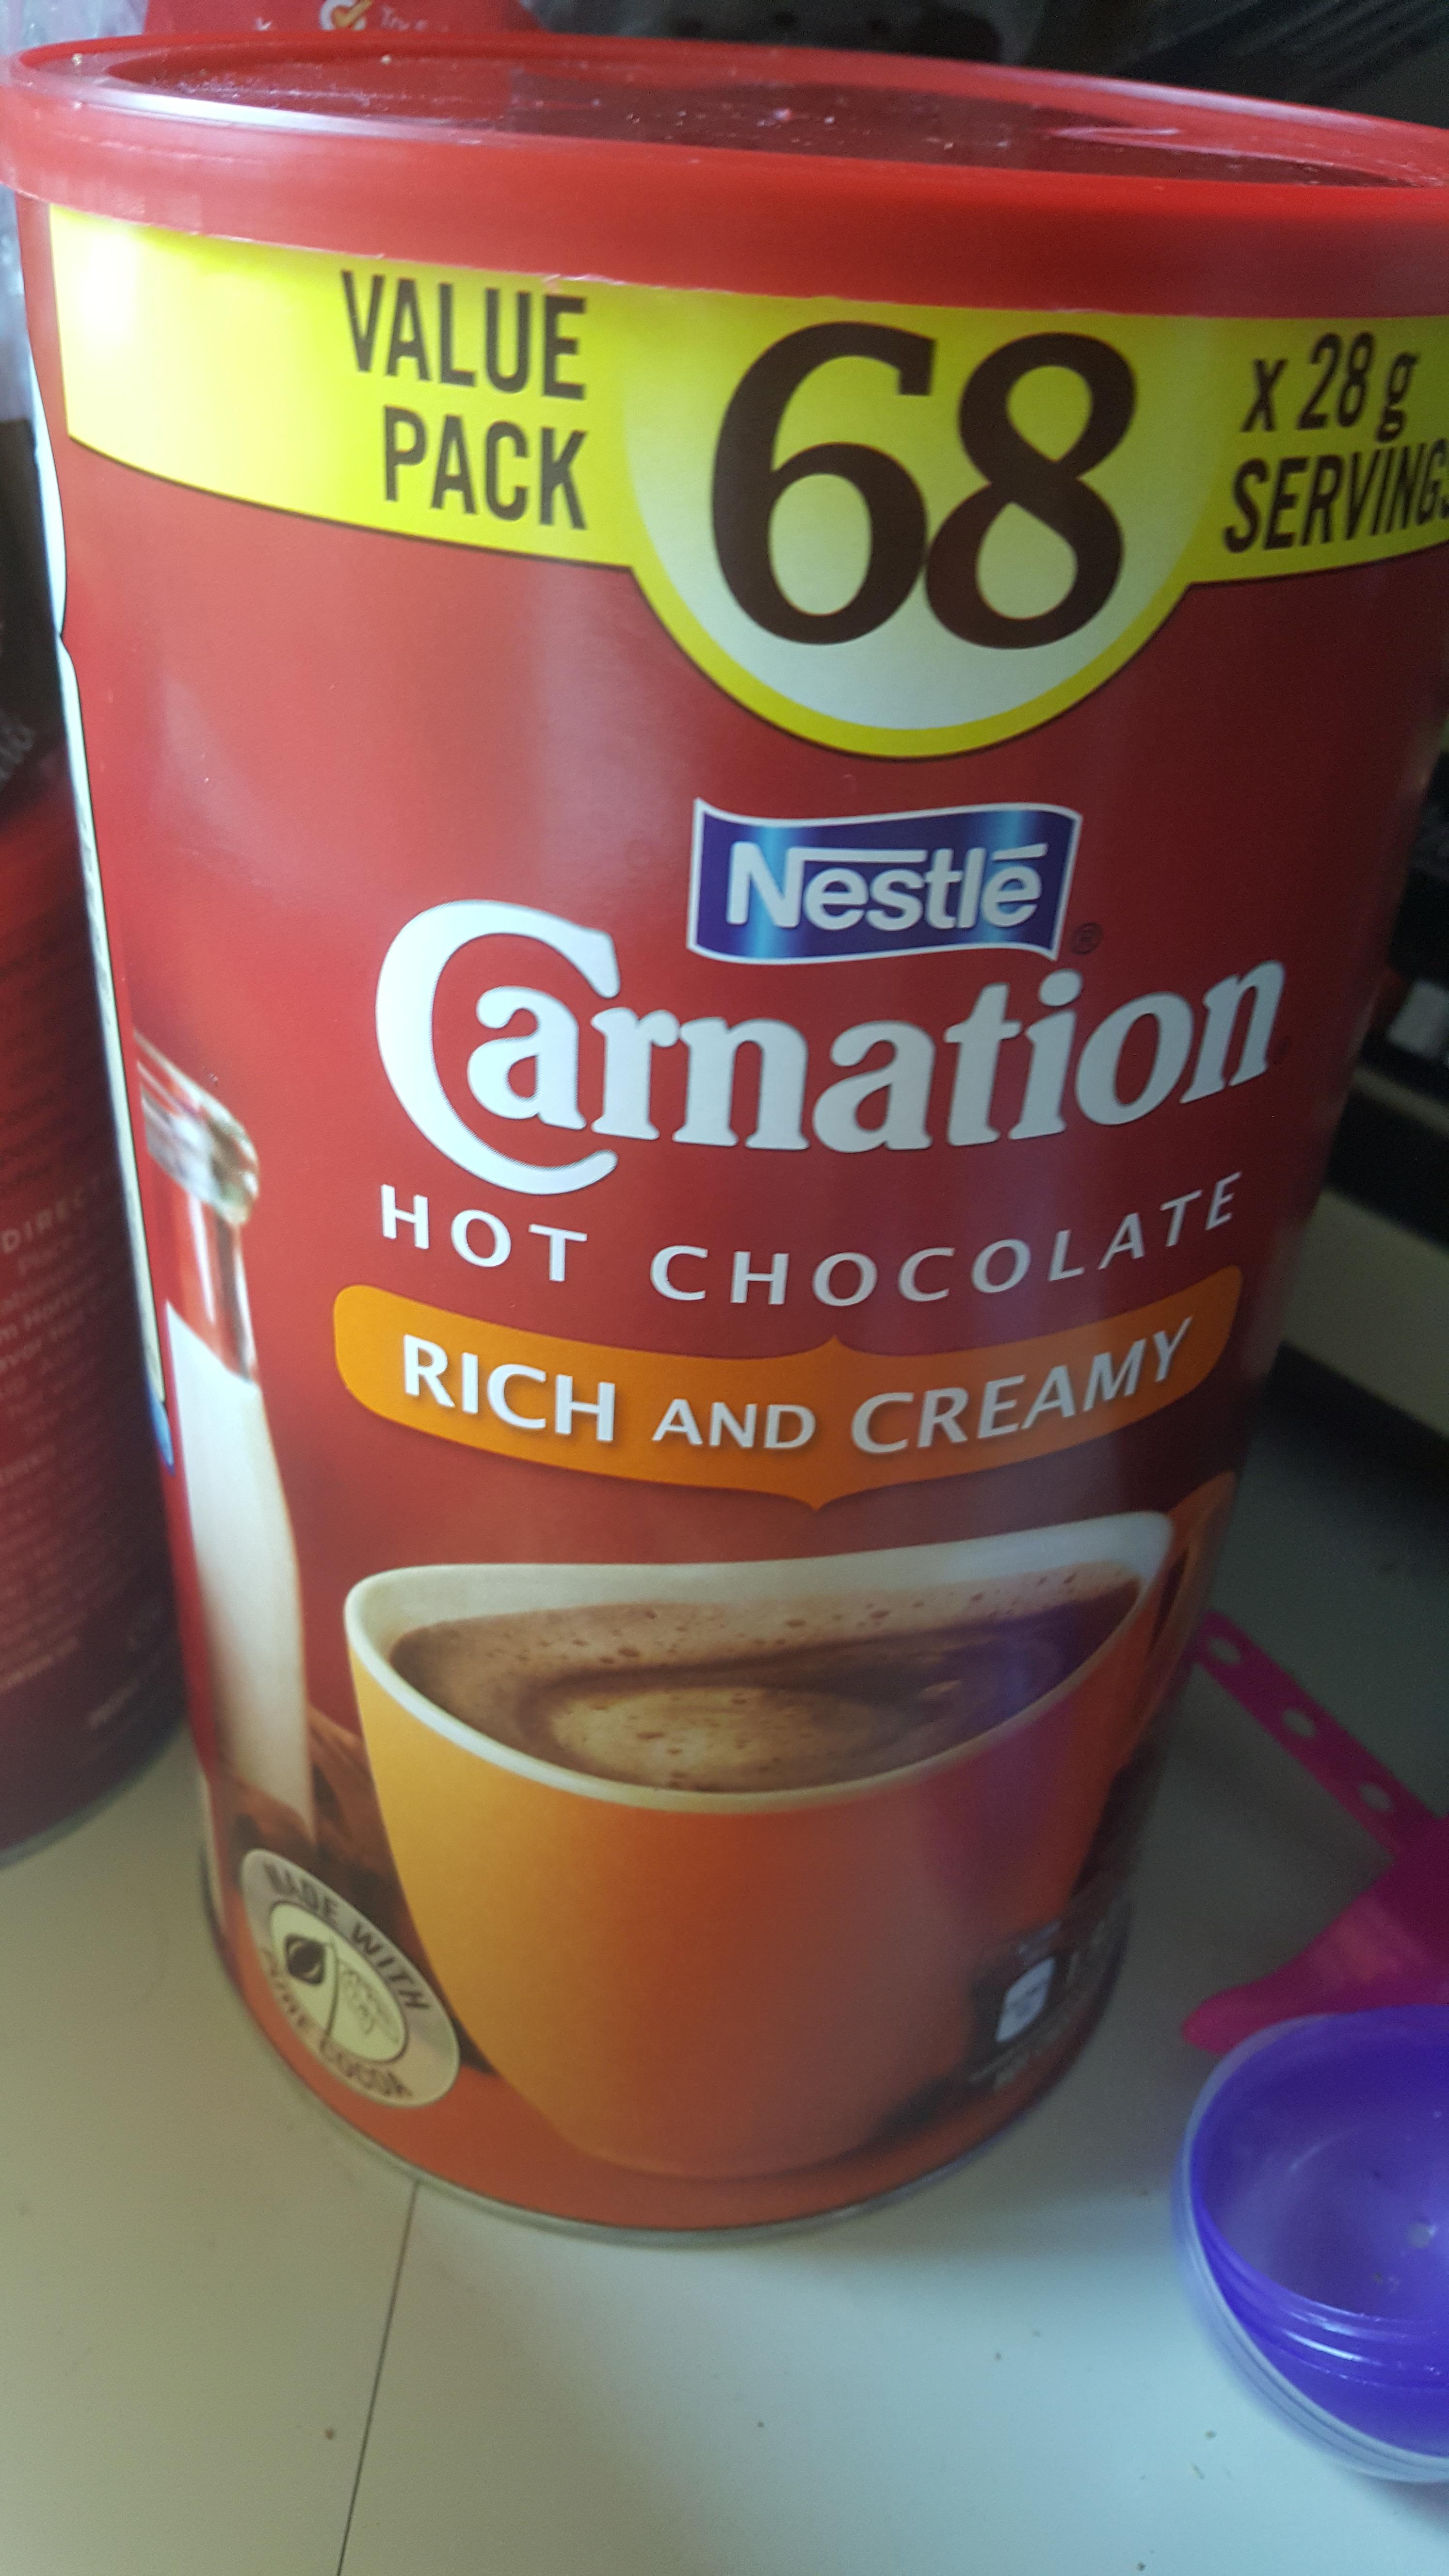 Nestle Carnation Hot Chocolate reviews in Hot Chocolate - ChickAdvisor